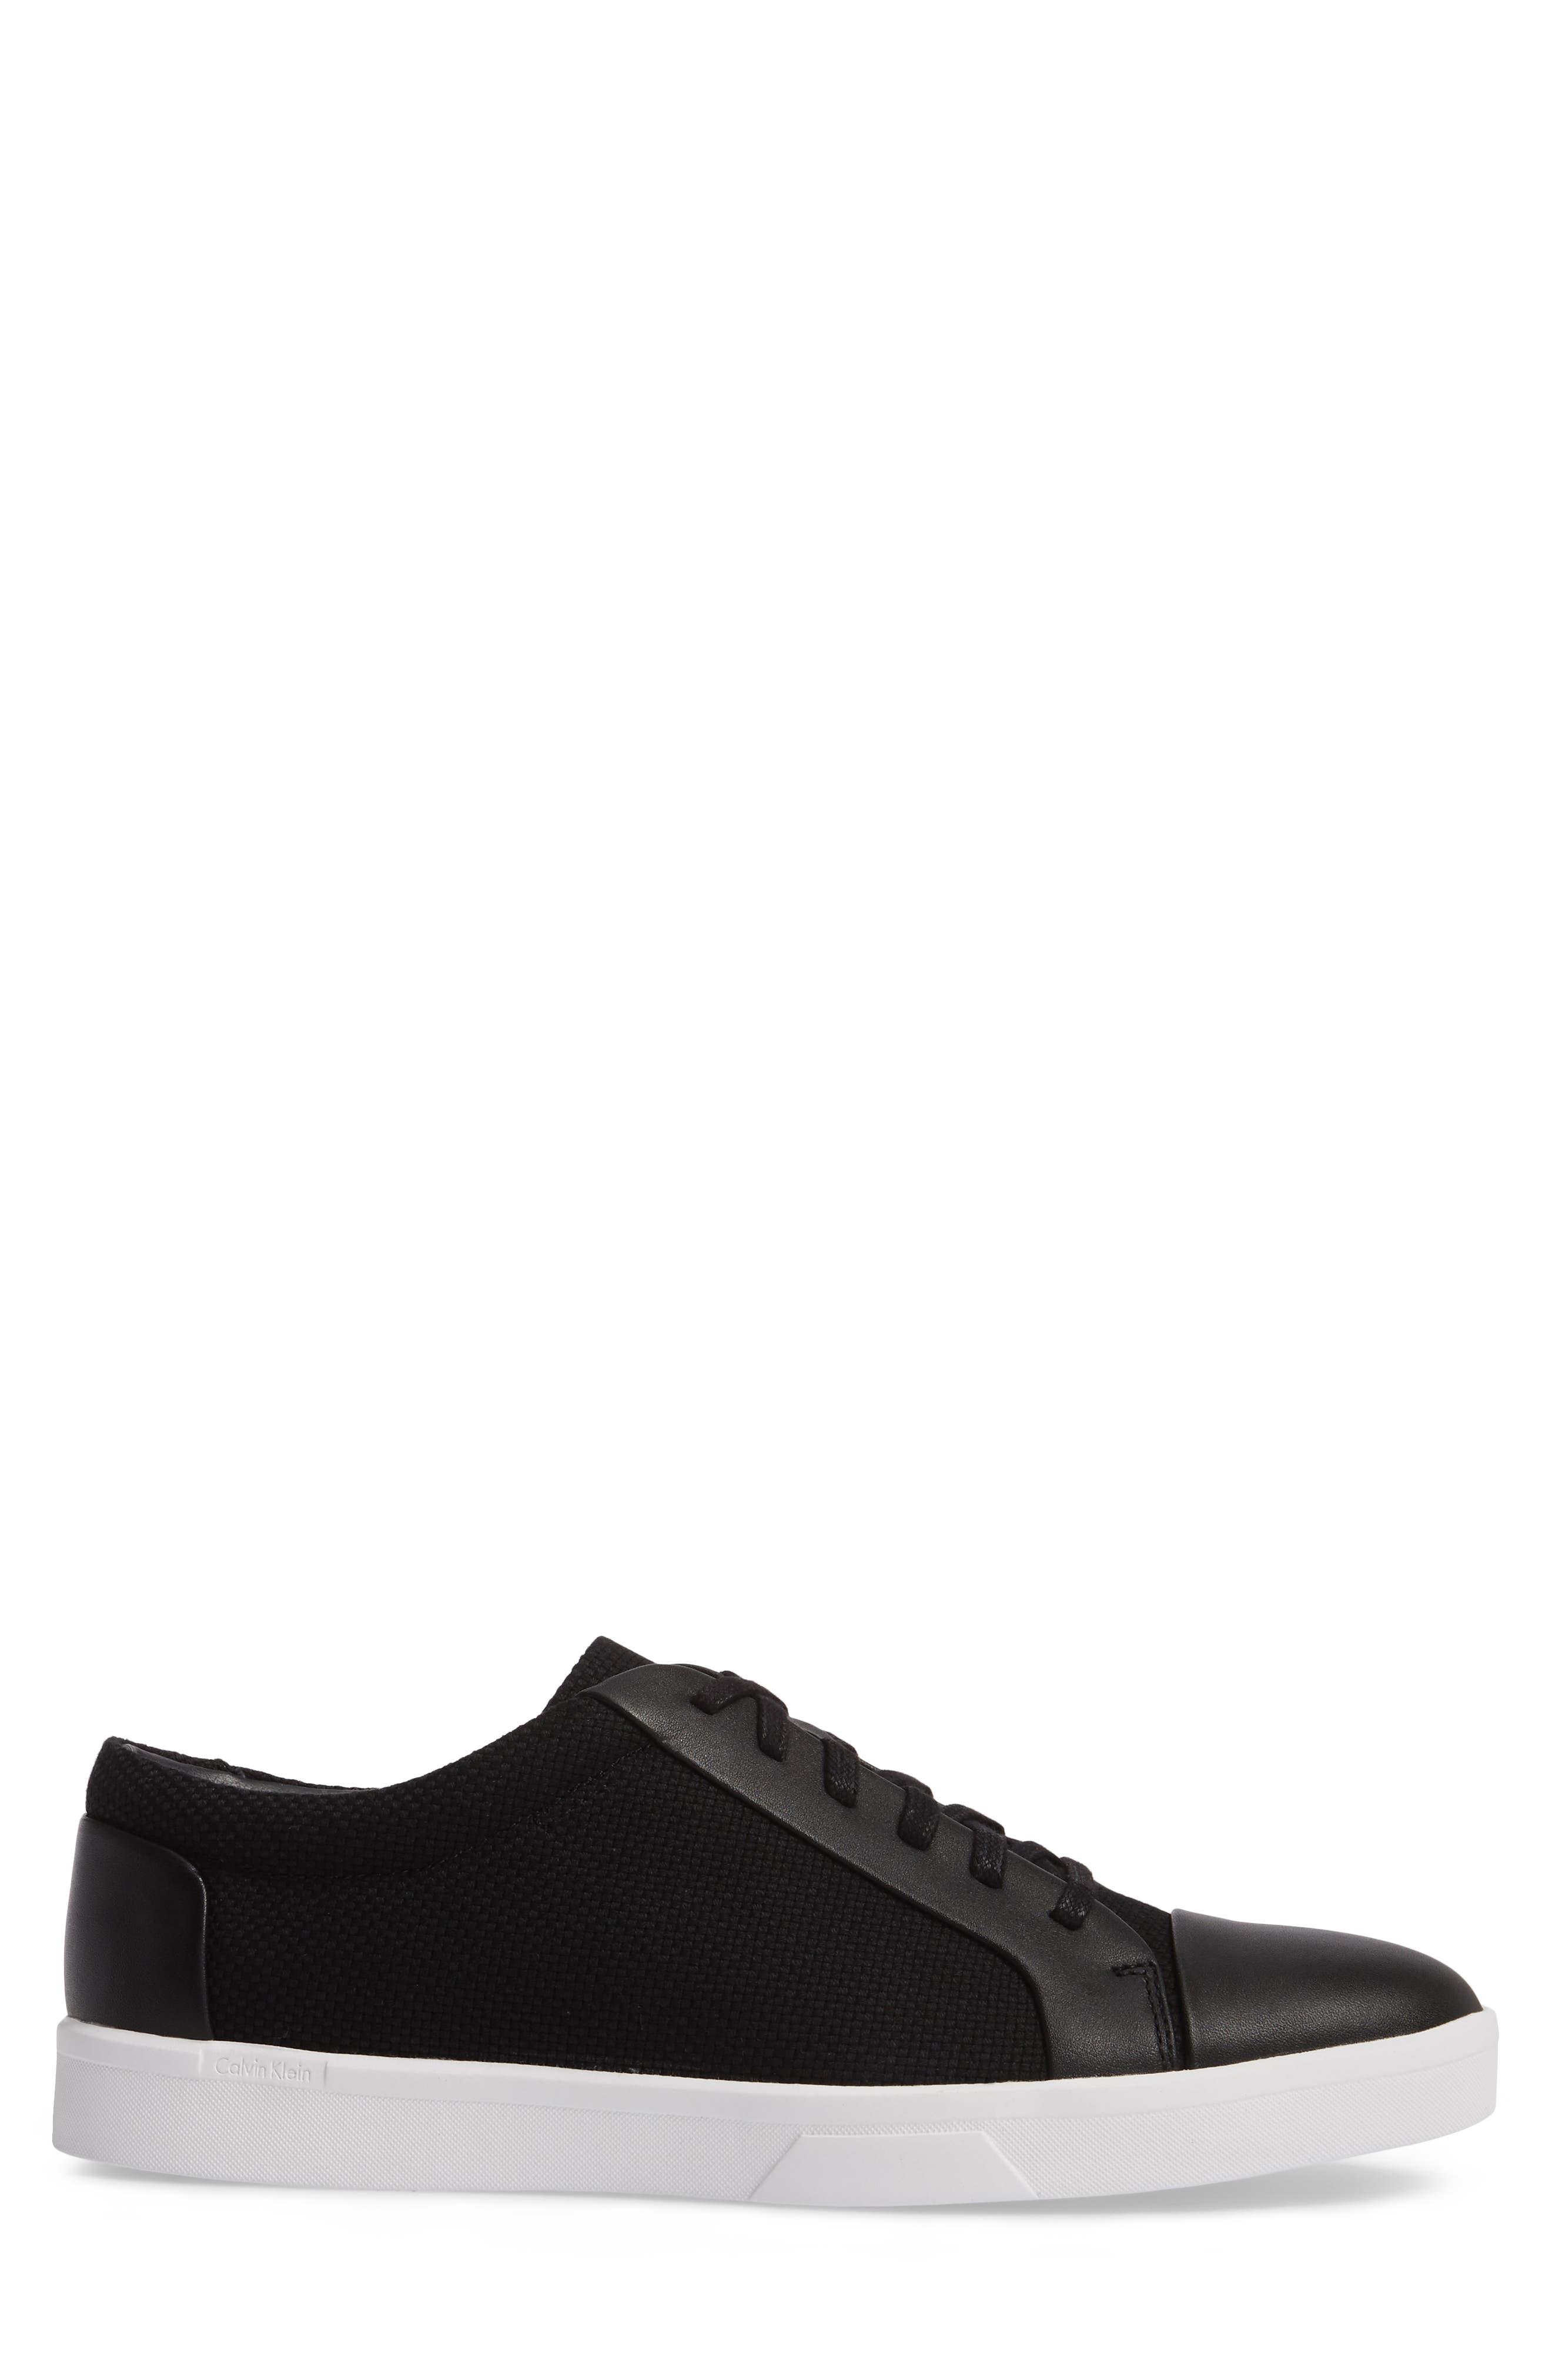 'Igor' Sneaker,                             Alternate thumbnail 3, color,                             005